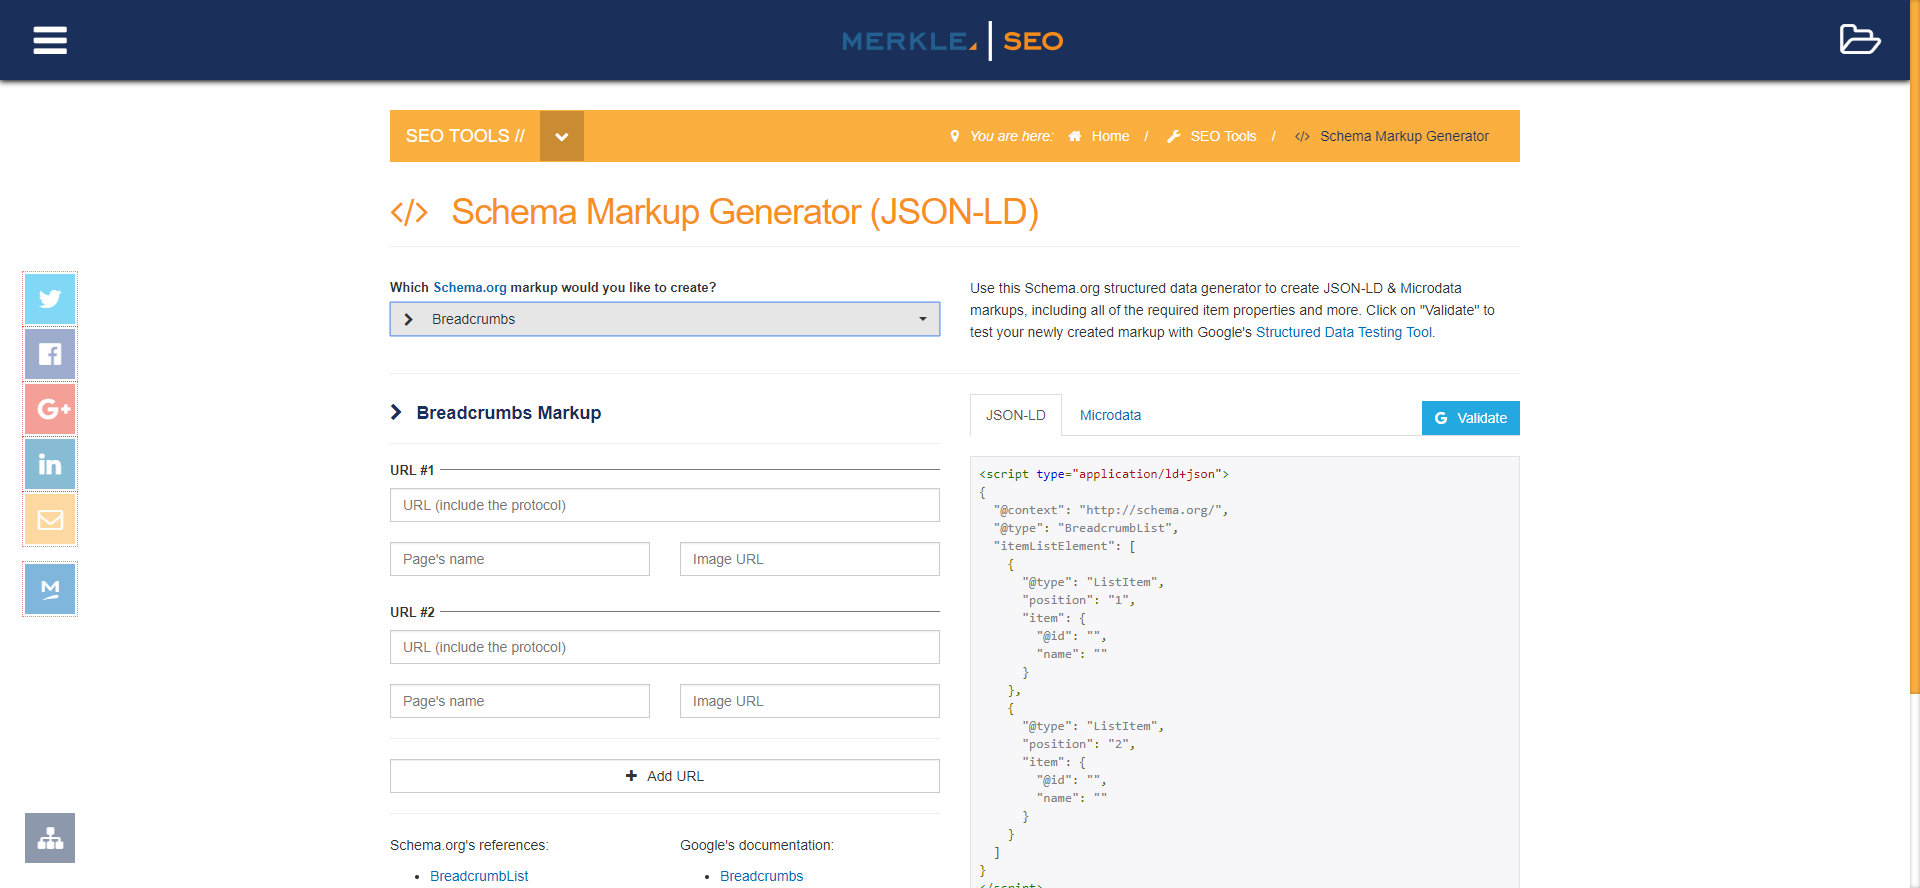 Schema Markup Generator (JSON-LD)